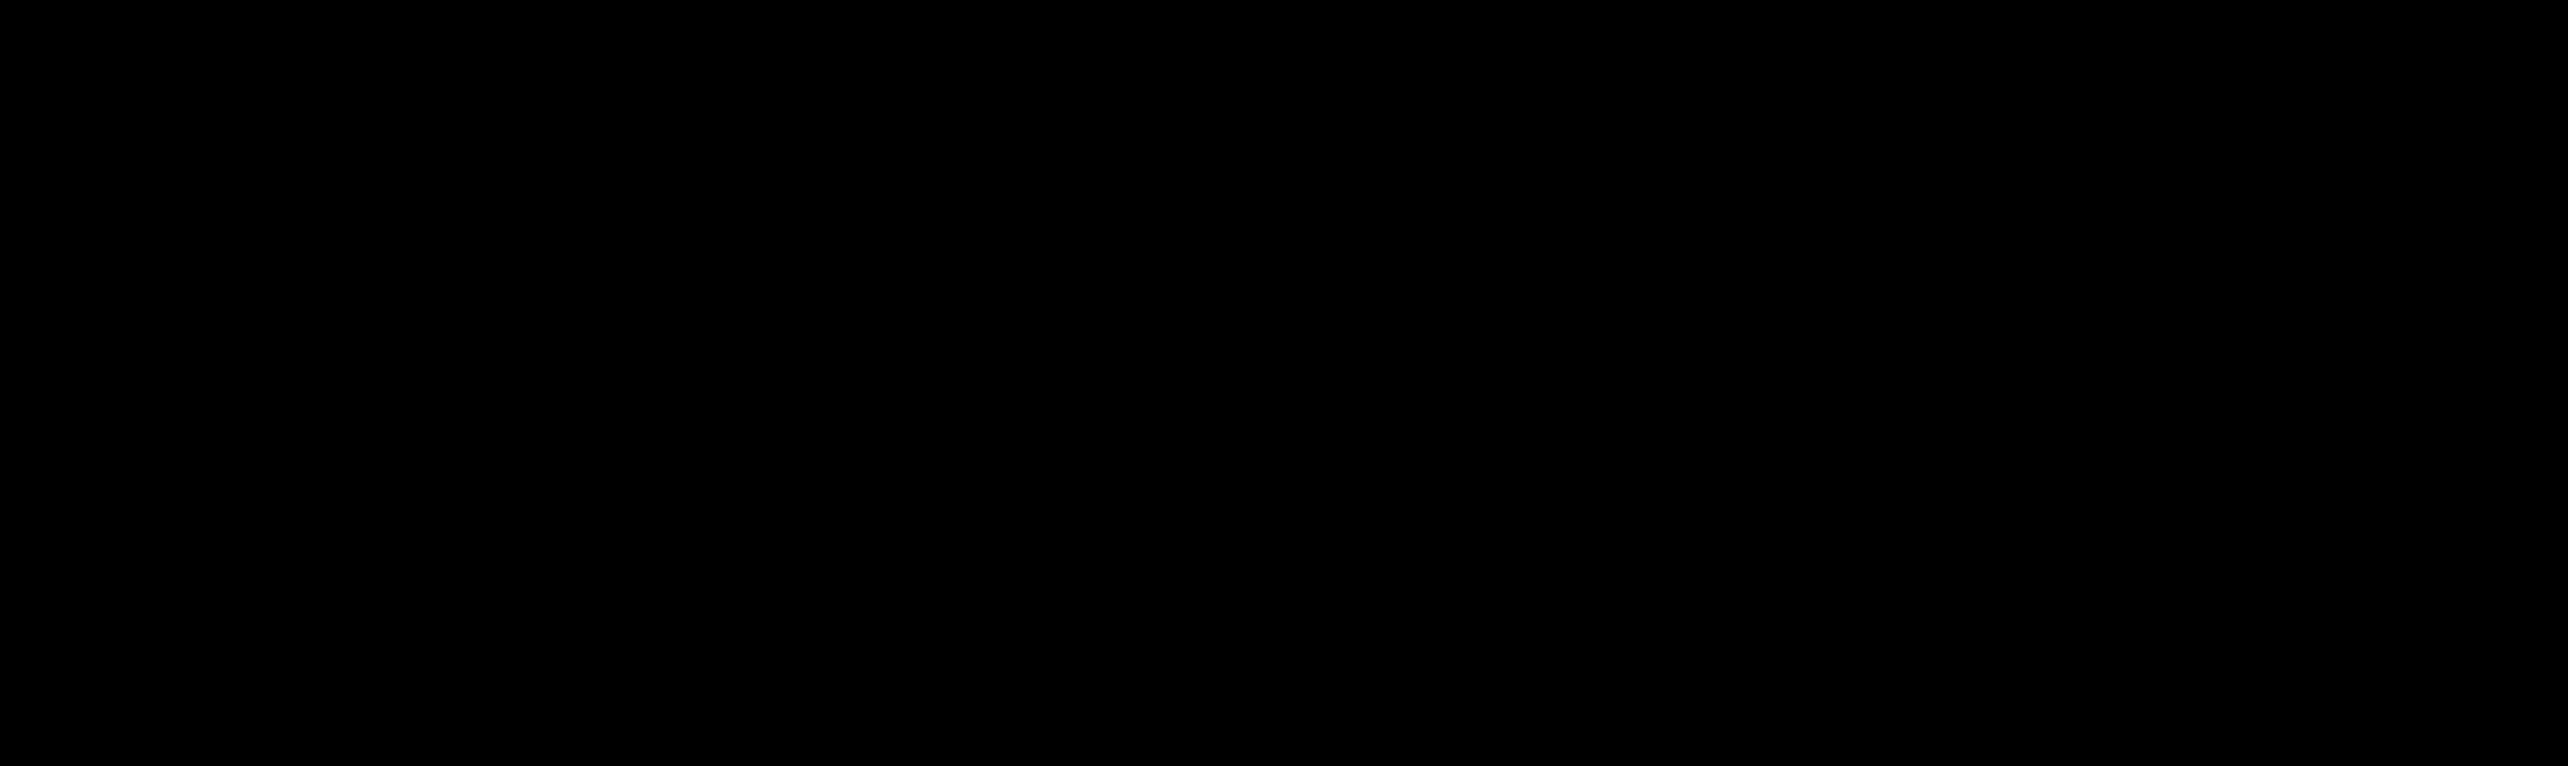 Aplysamine-d<sub>3</sub> 6